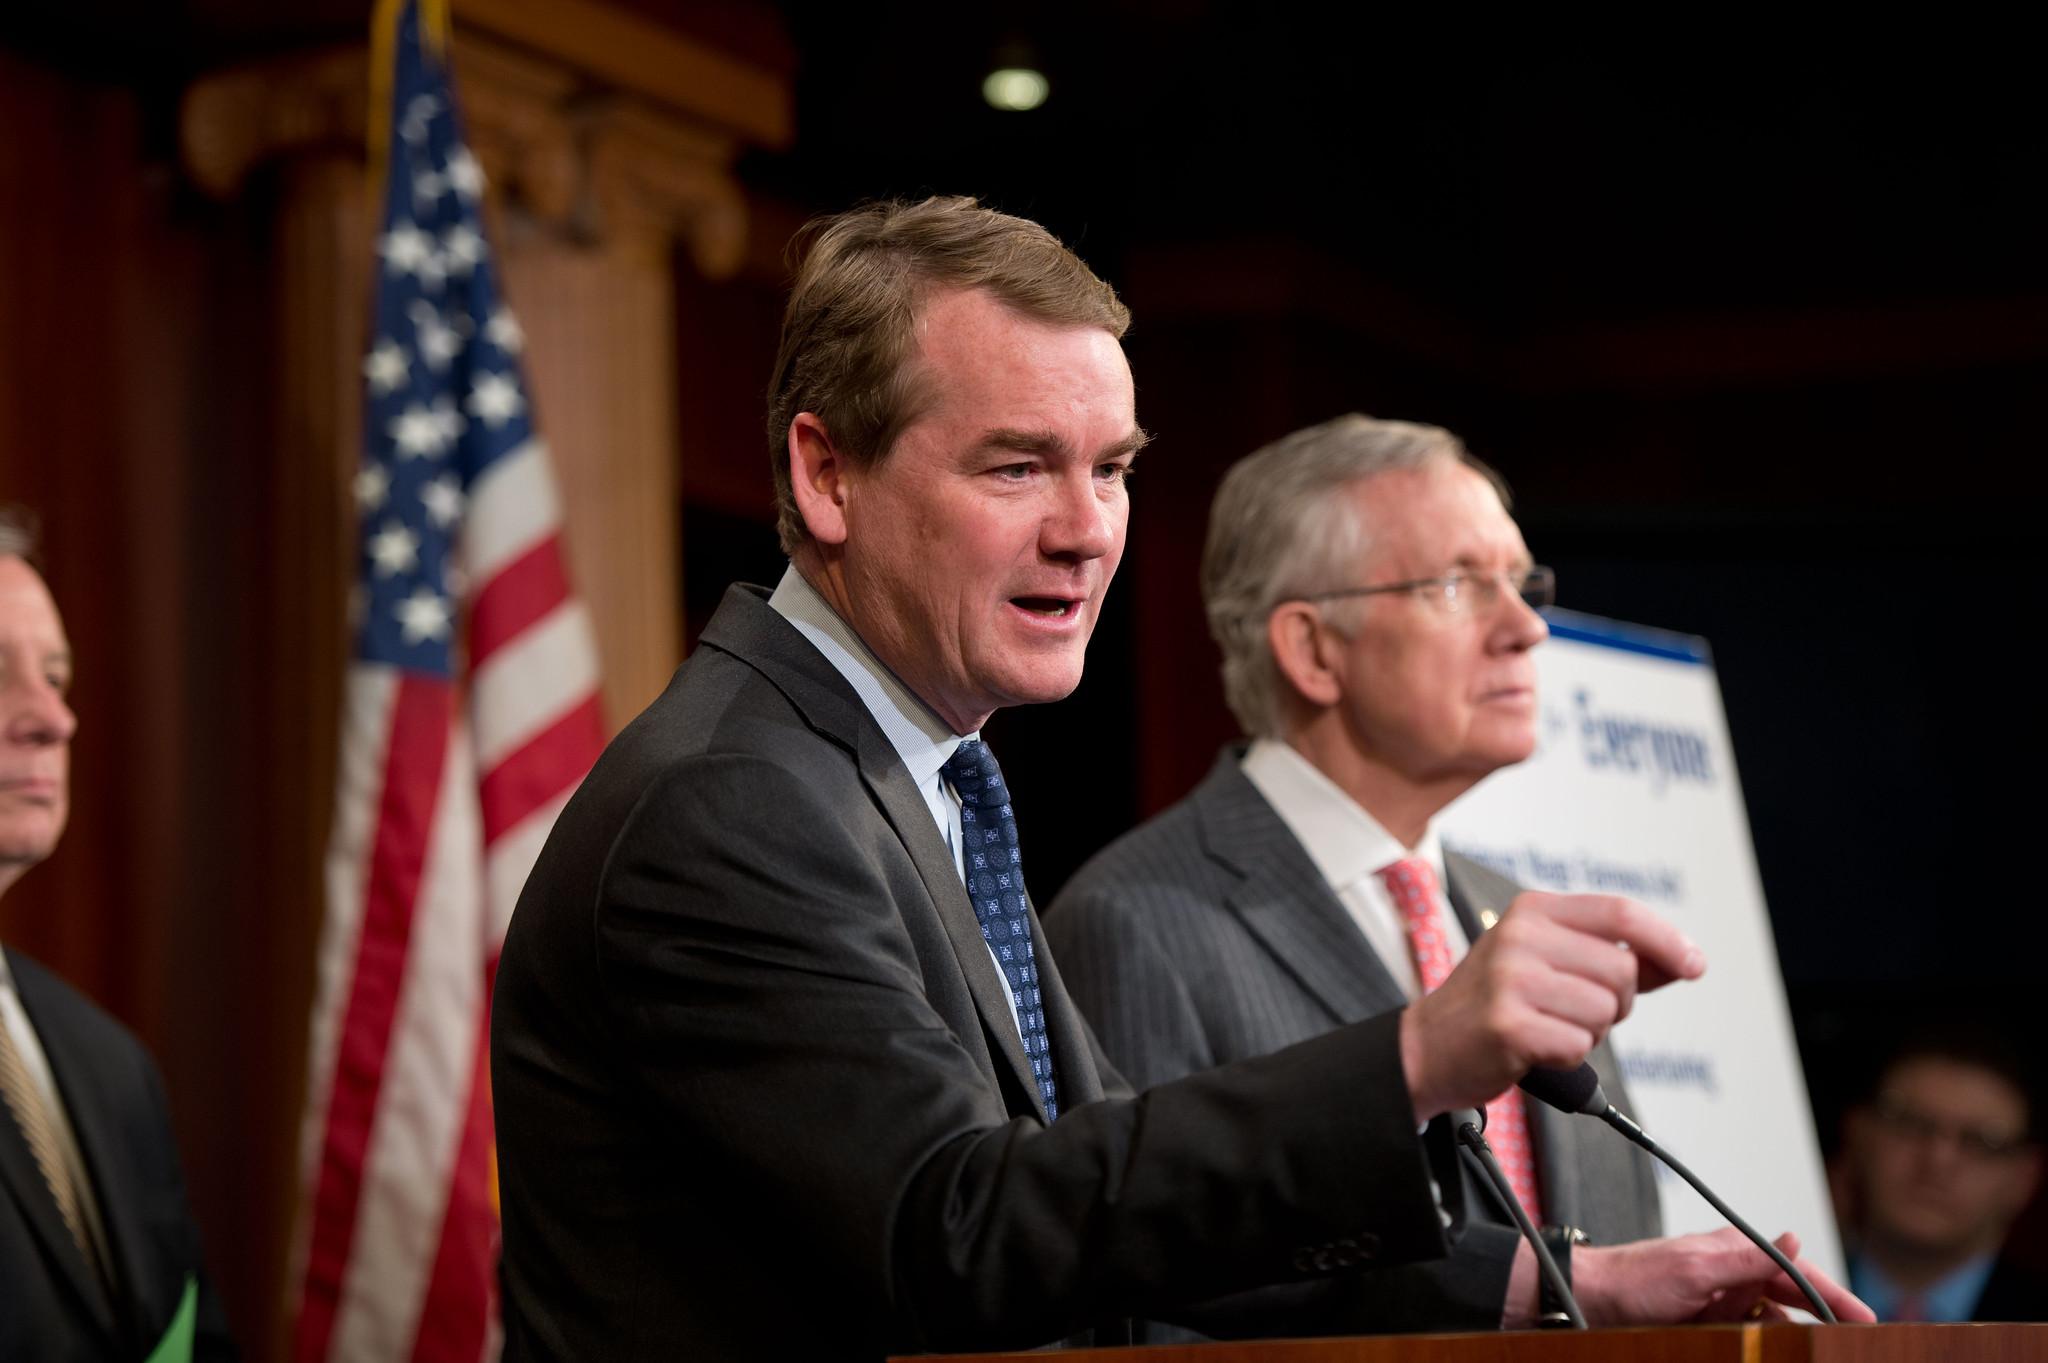 FITSNews – Michael Bennet Headed To South Carolina's 'Corridor Of Shame'